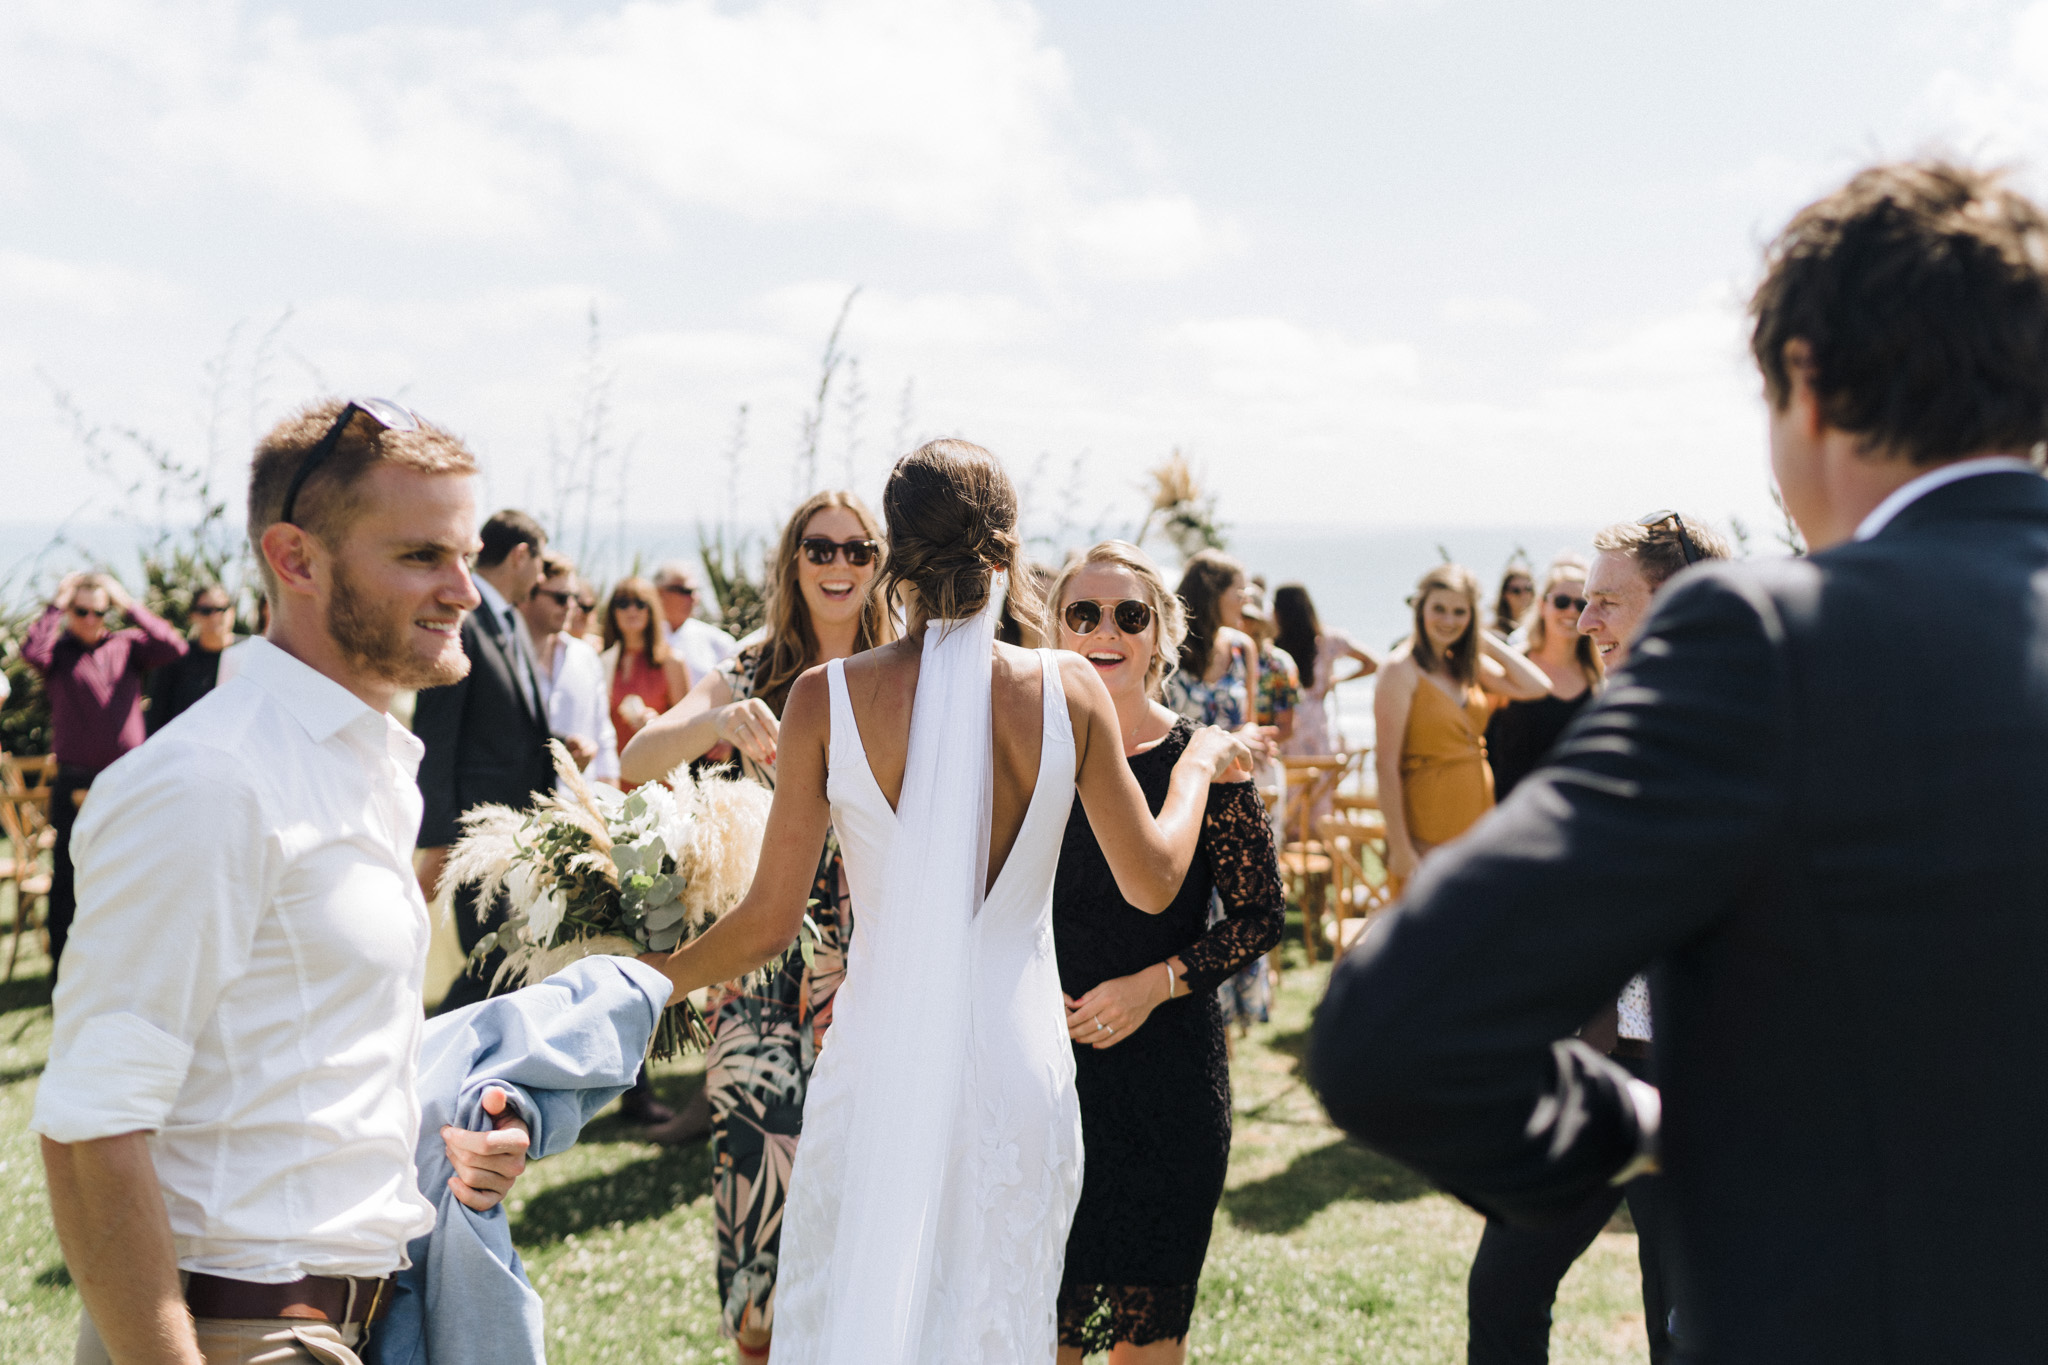 newfound-h-m-castaways-waiuku-auckland-wedding-photographer-133